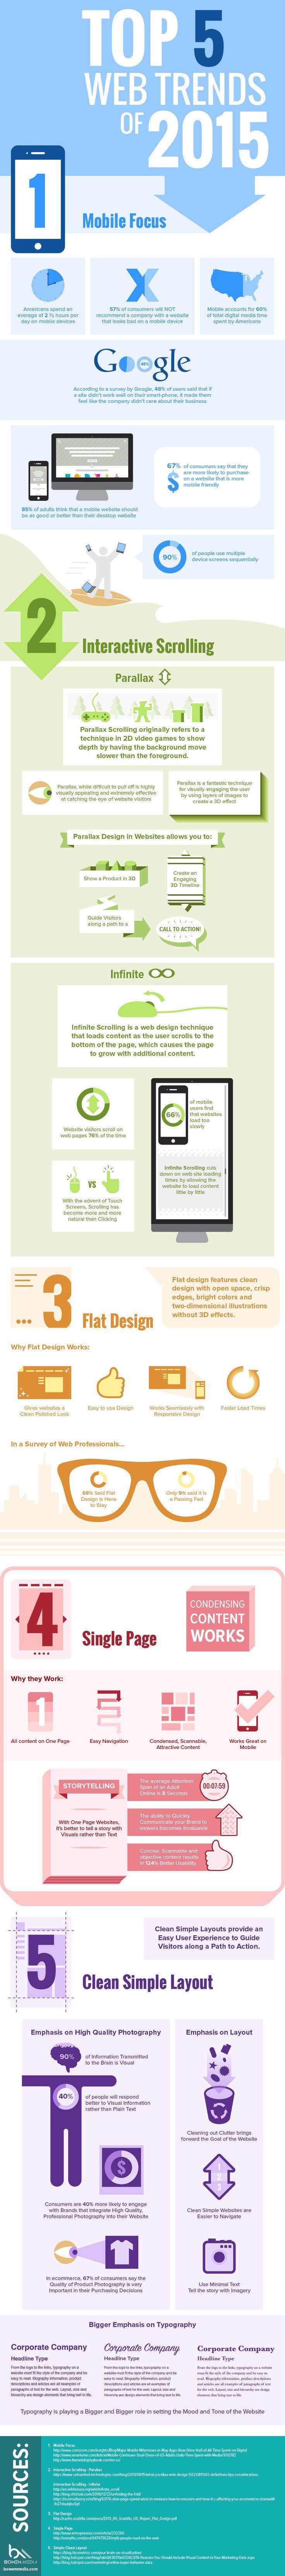 Top 5 Web Design Trends For 2015 Web Design Trends Web Design Tips Web Design